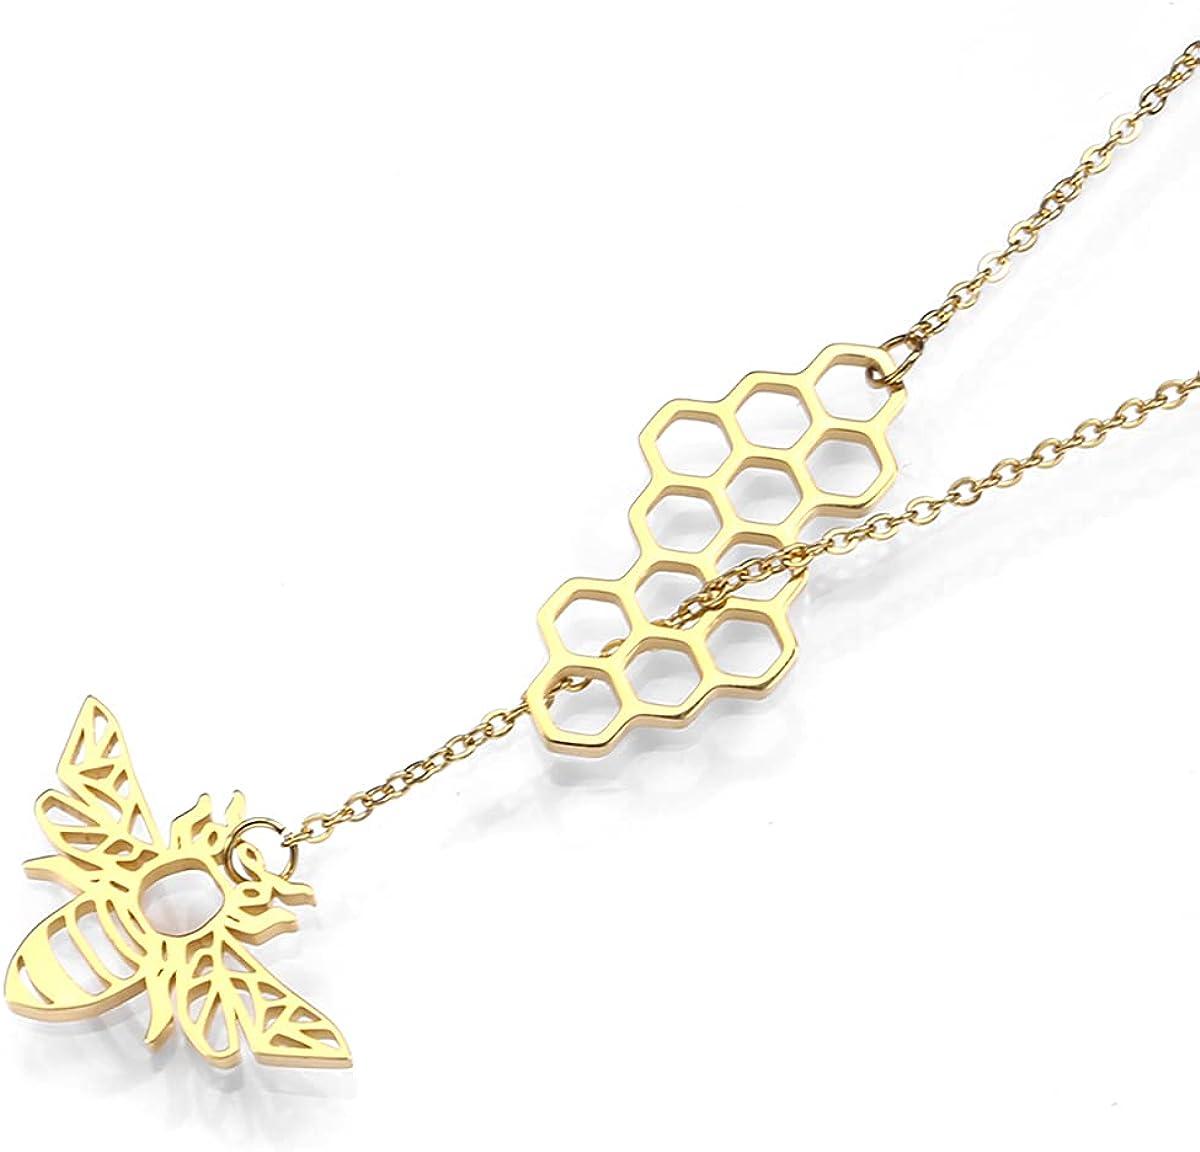 Origami Honey Bee Honeycomb Pendant Necklace Earrings for Women Bumblebee Beehive Adjustable Lariat Y Necklace Jewelry